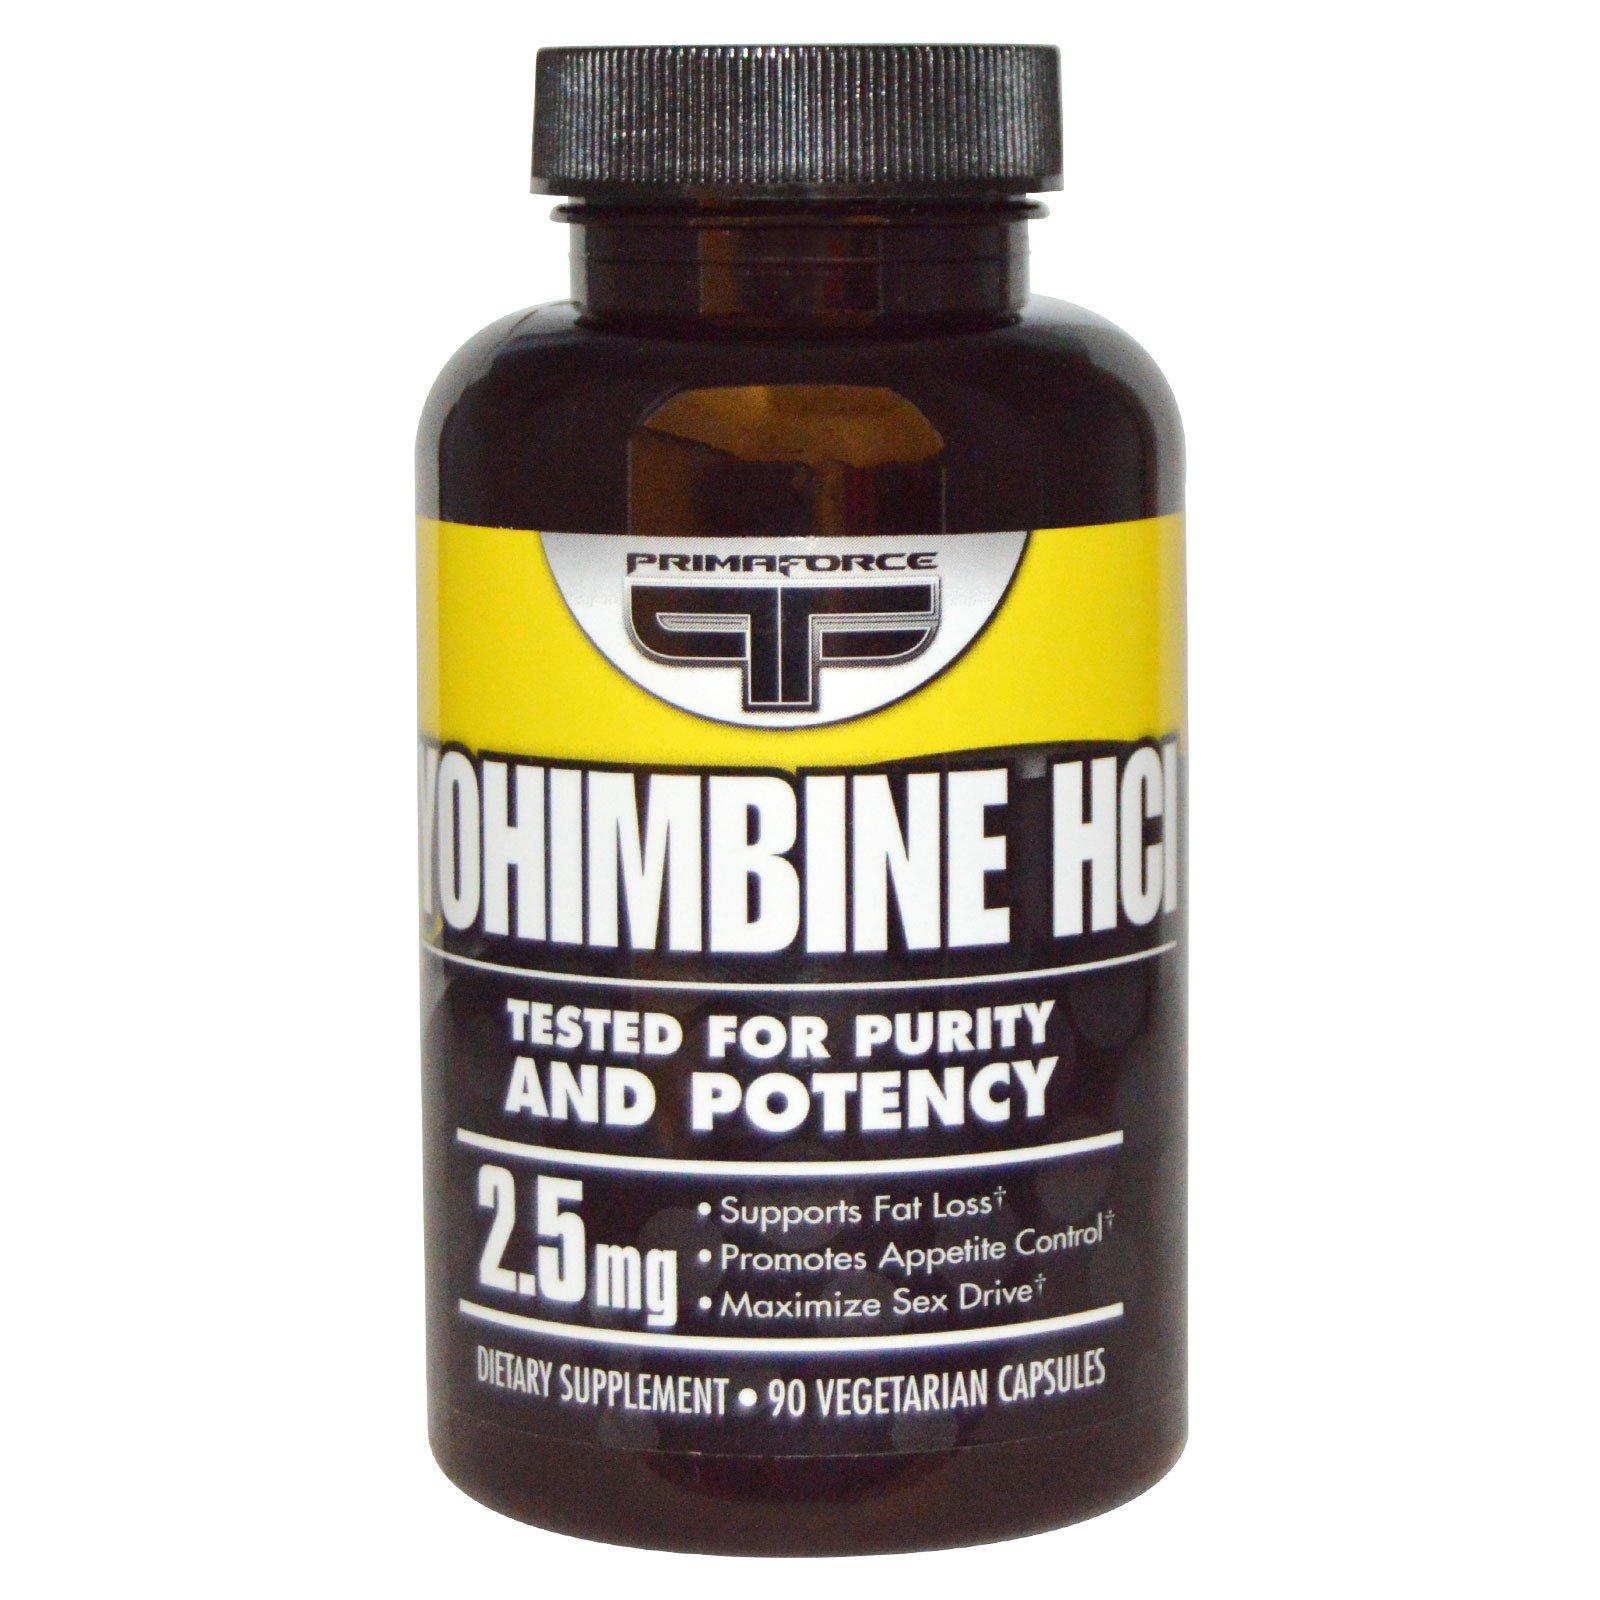 Primaforce, Иохимбин HCL, 2,5 мг, 90 вегетарианских капсул